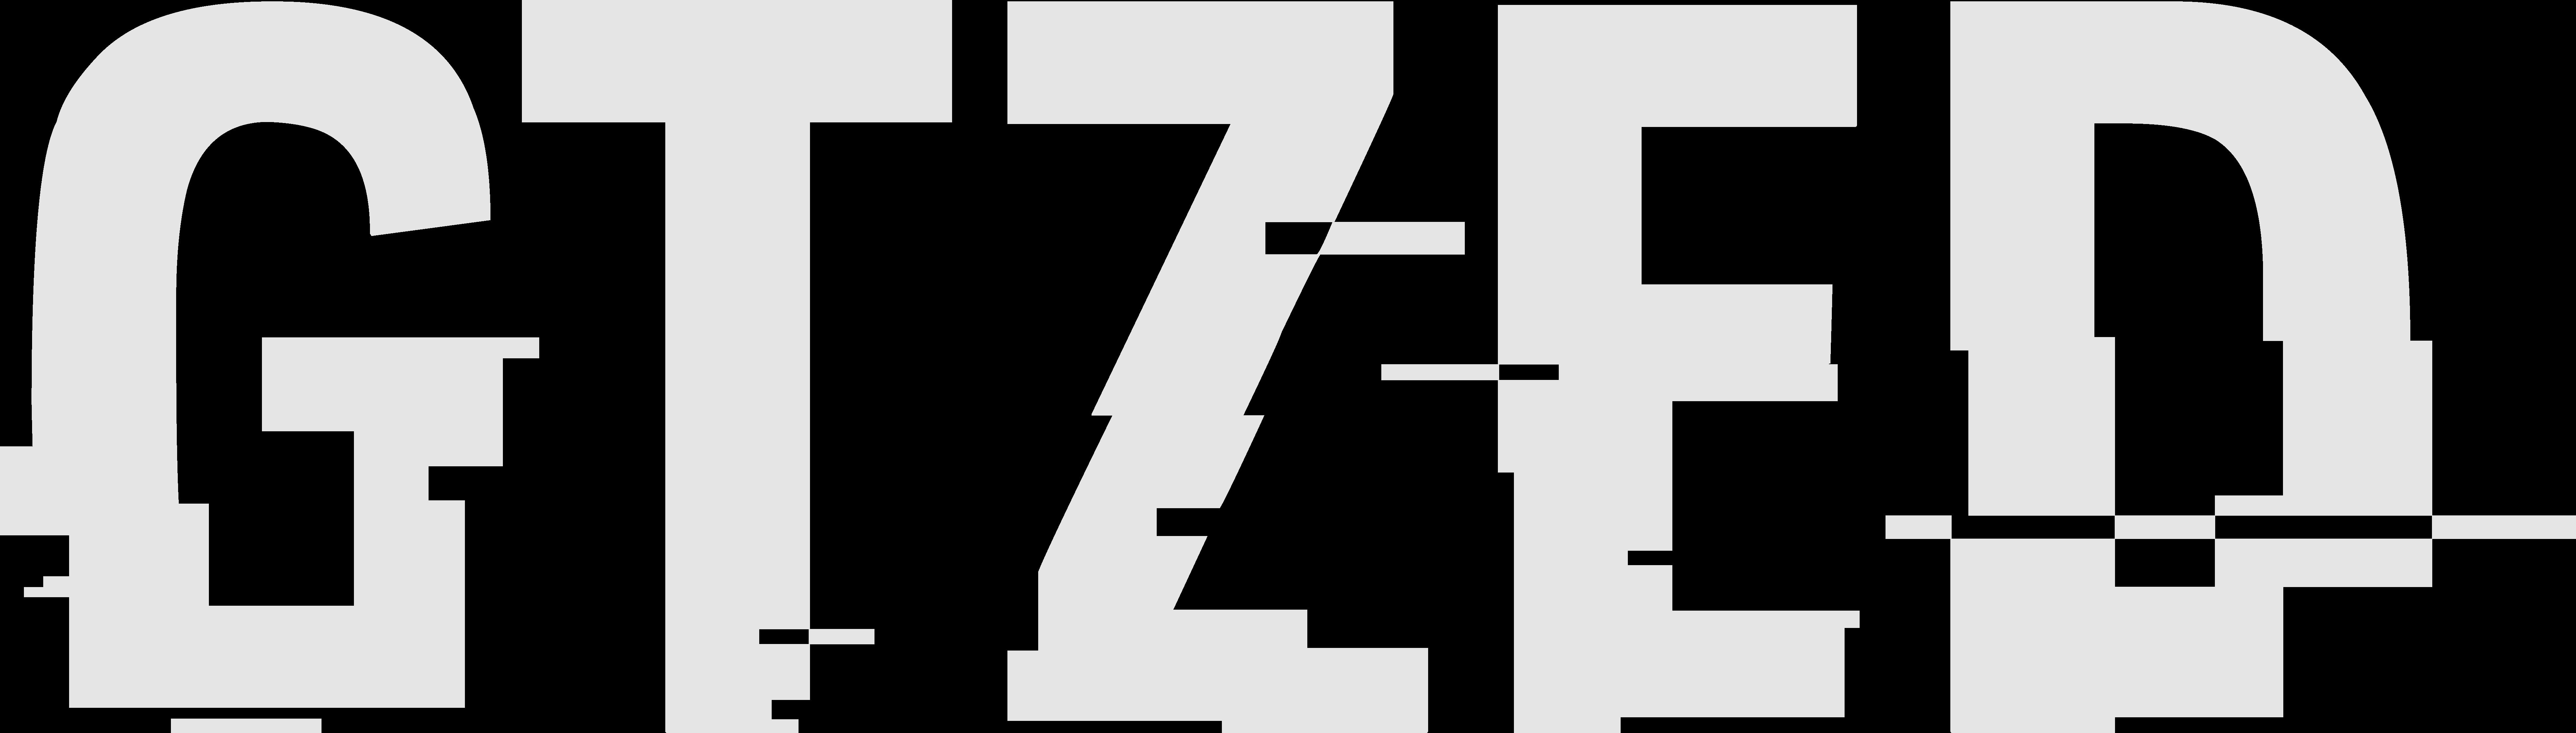 gtzed,com